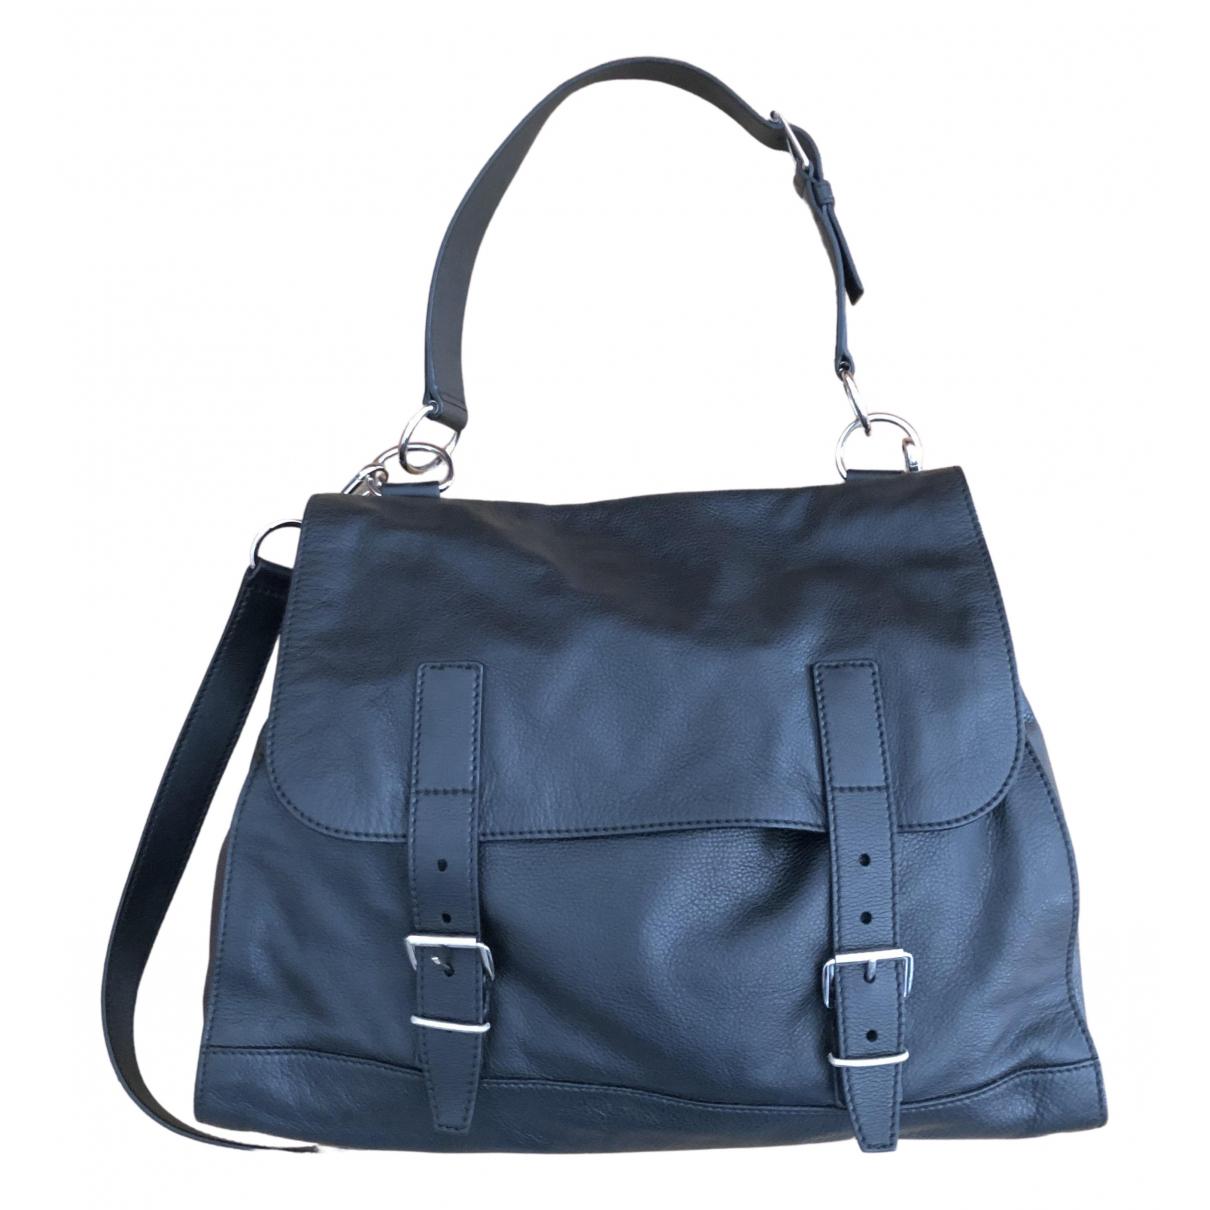 Yves Saint Laurent N Black Leather bag for Men N